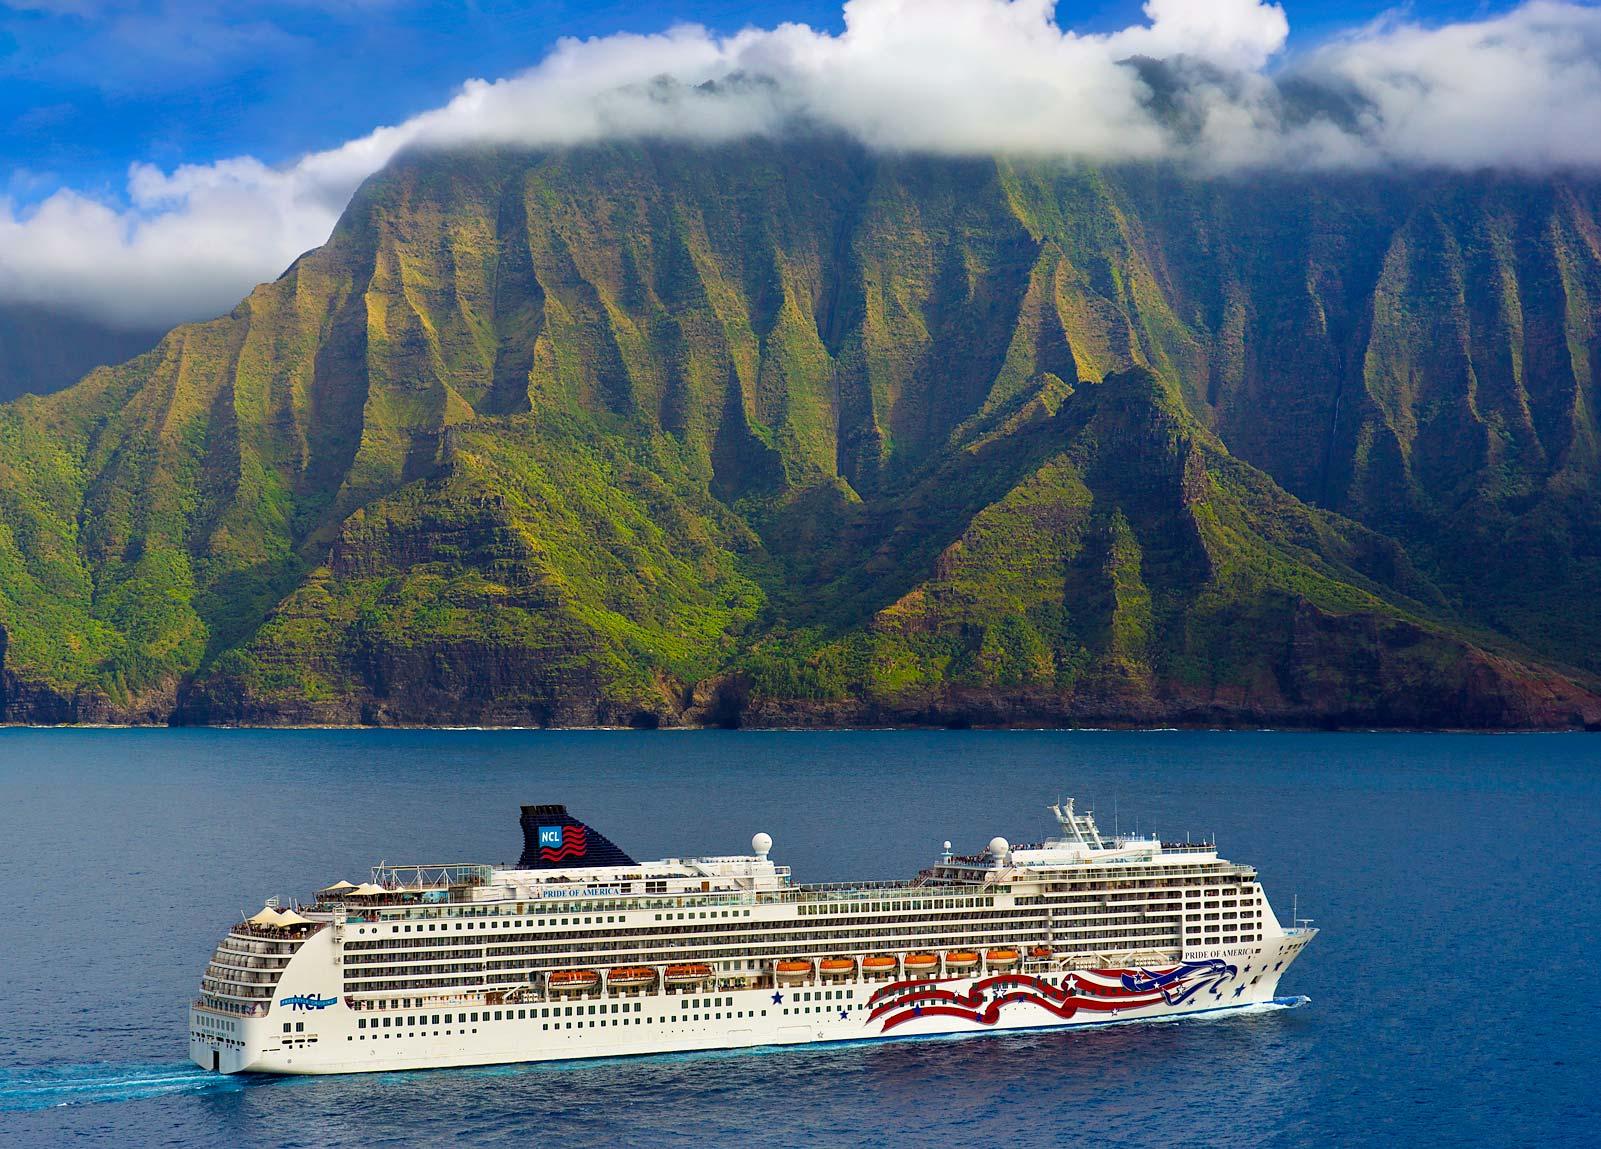 The Freedom Cruise sailed the Hawaiian Islands in 2006